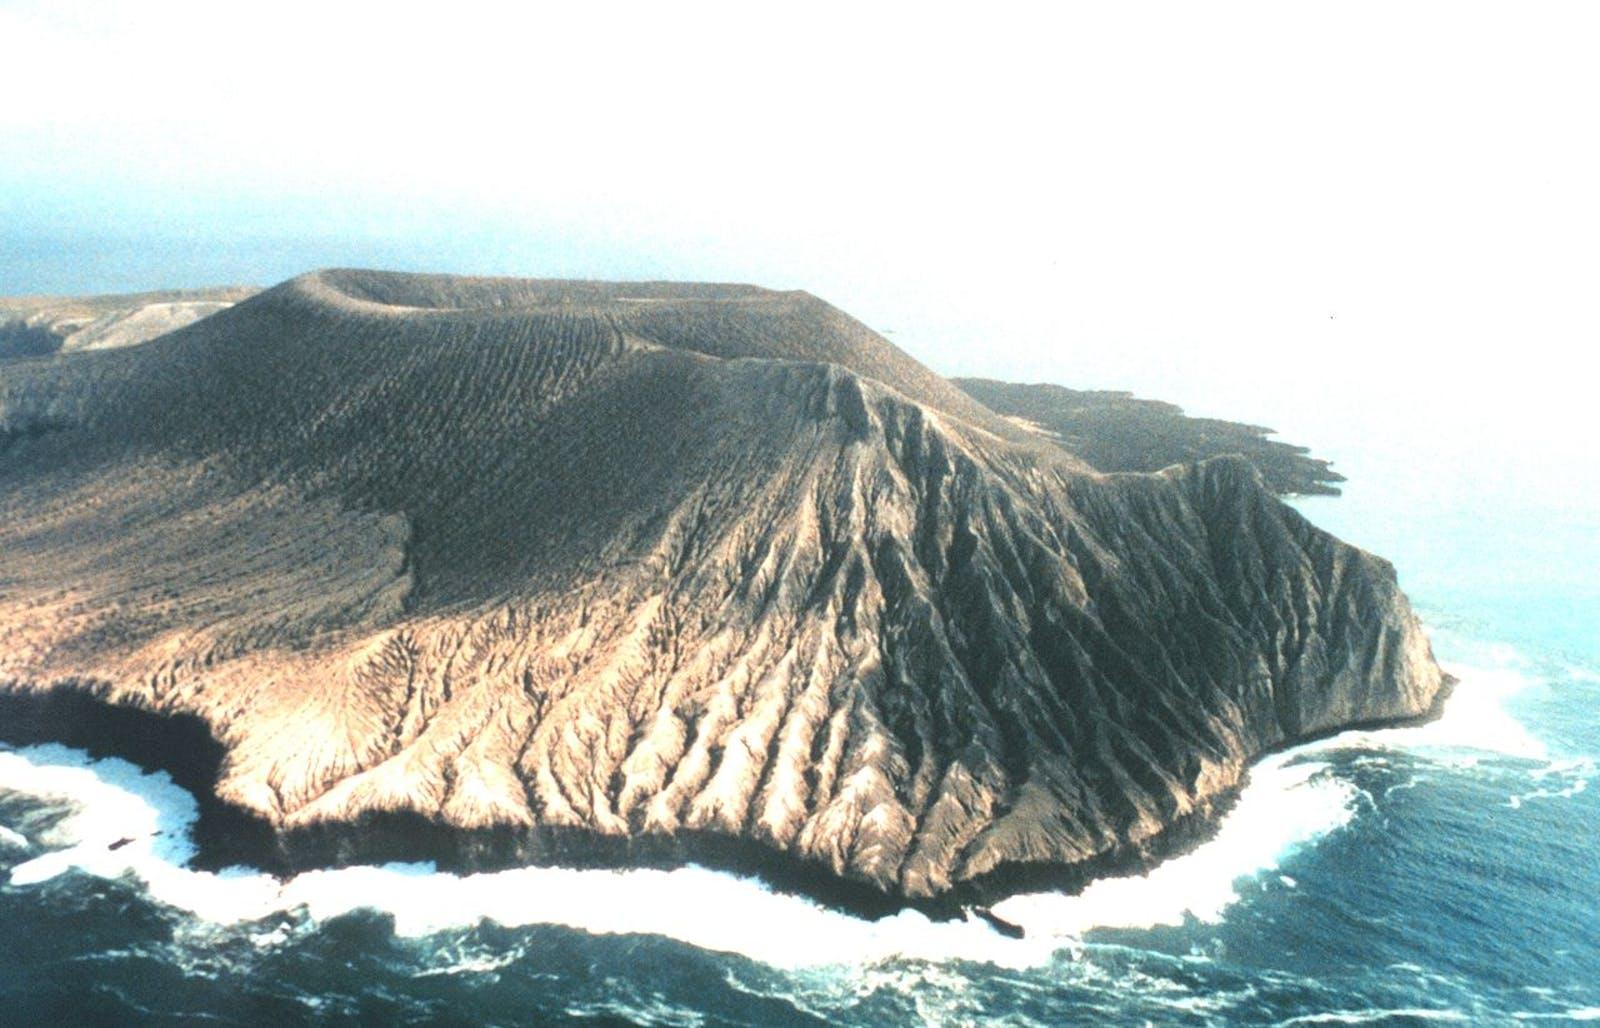 Islas Revillagigedo Dry Forests